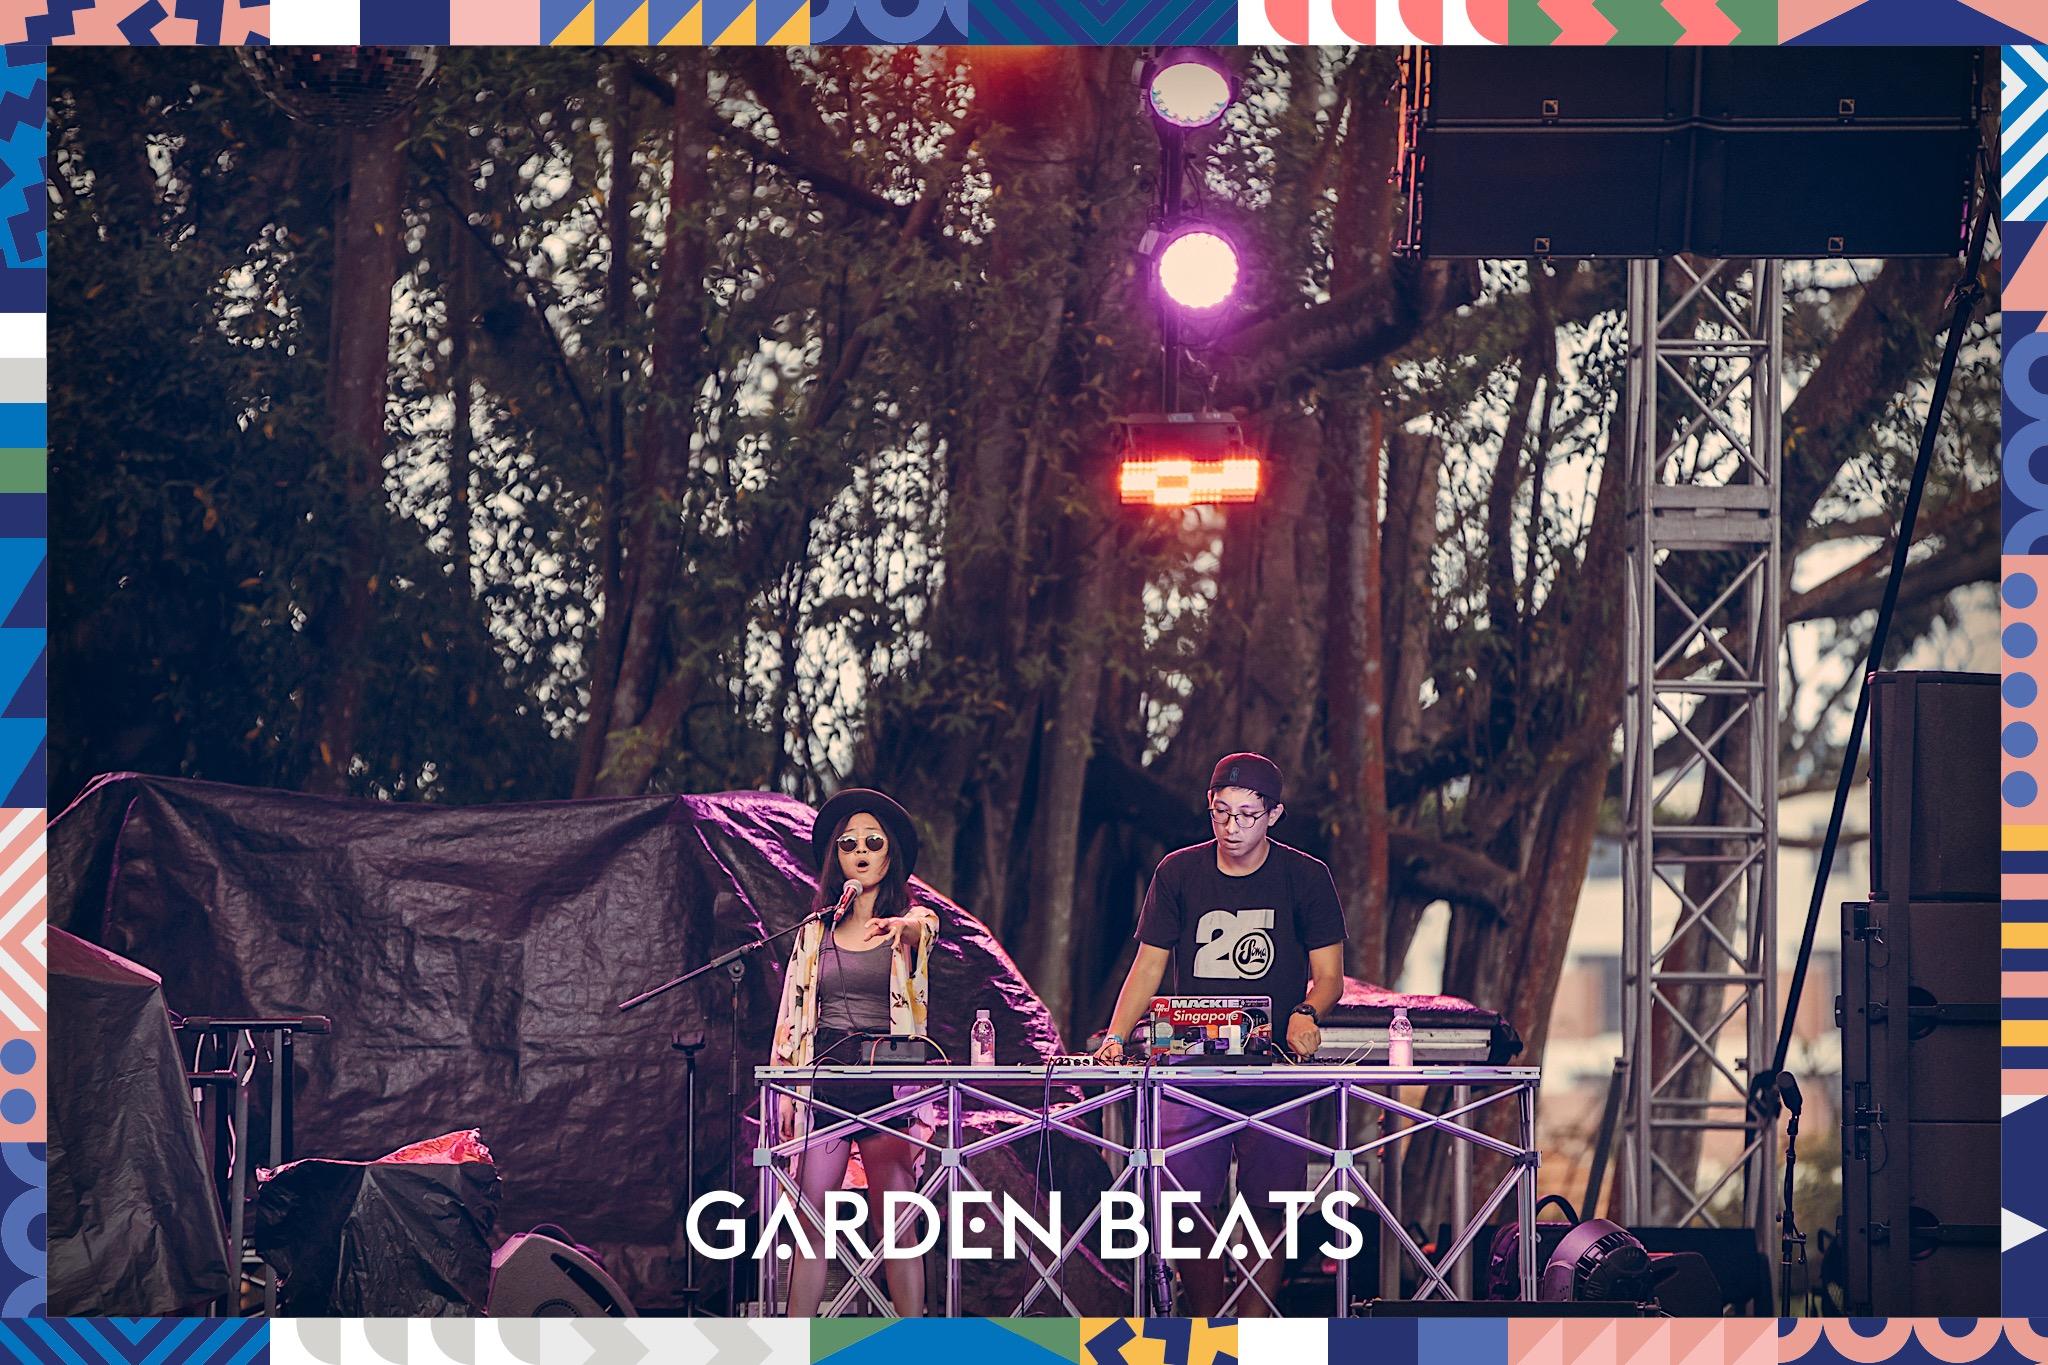 03032018_GardenBeats_Colossal421_Watermarked.jpg